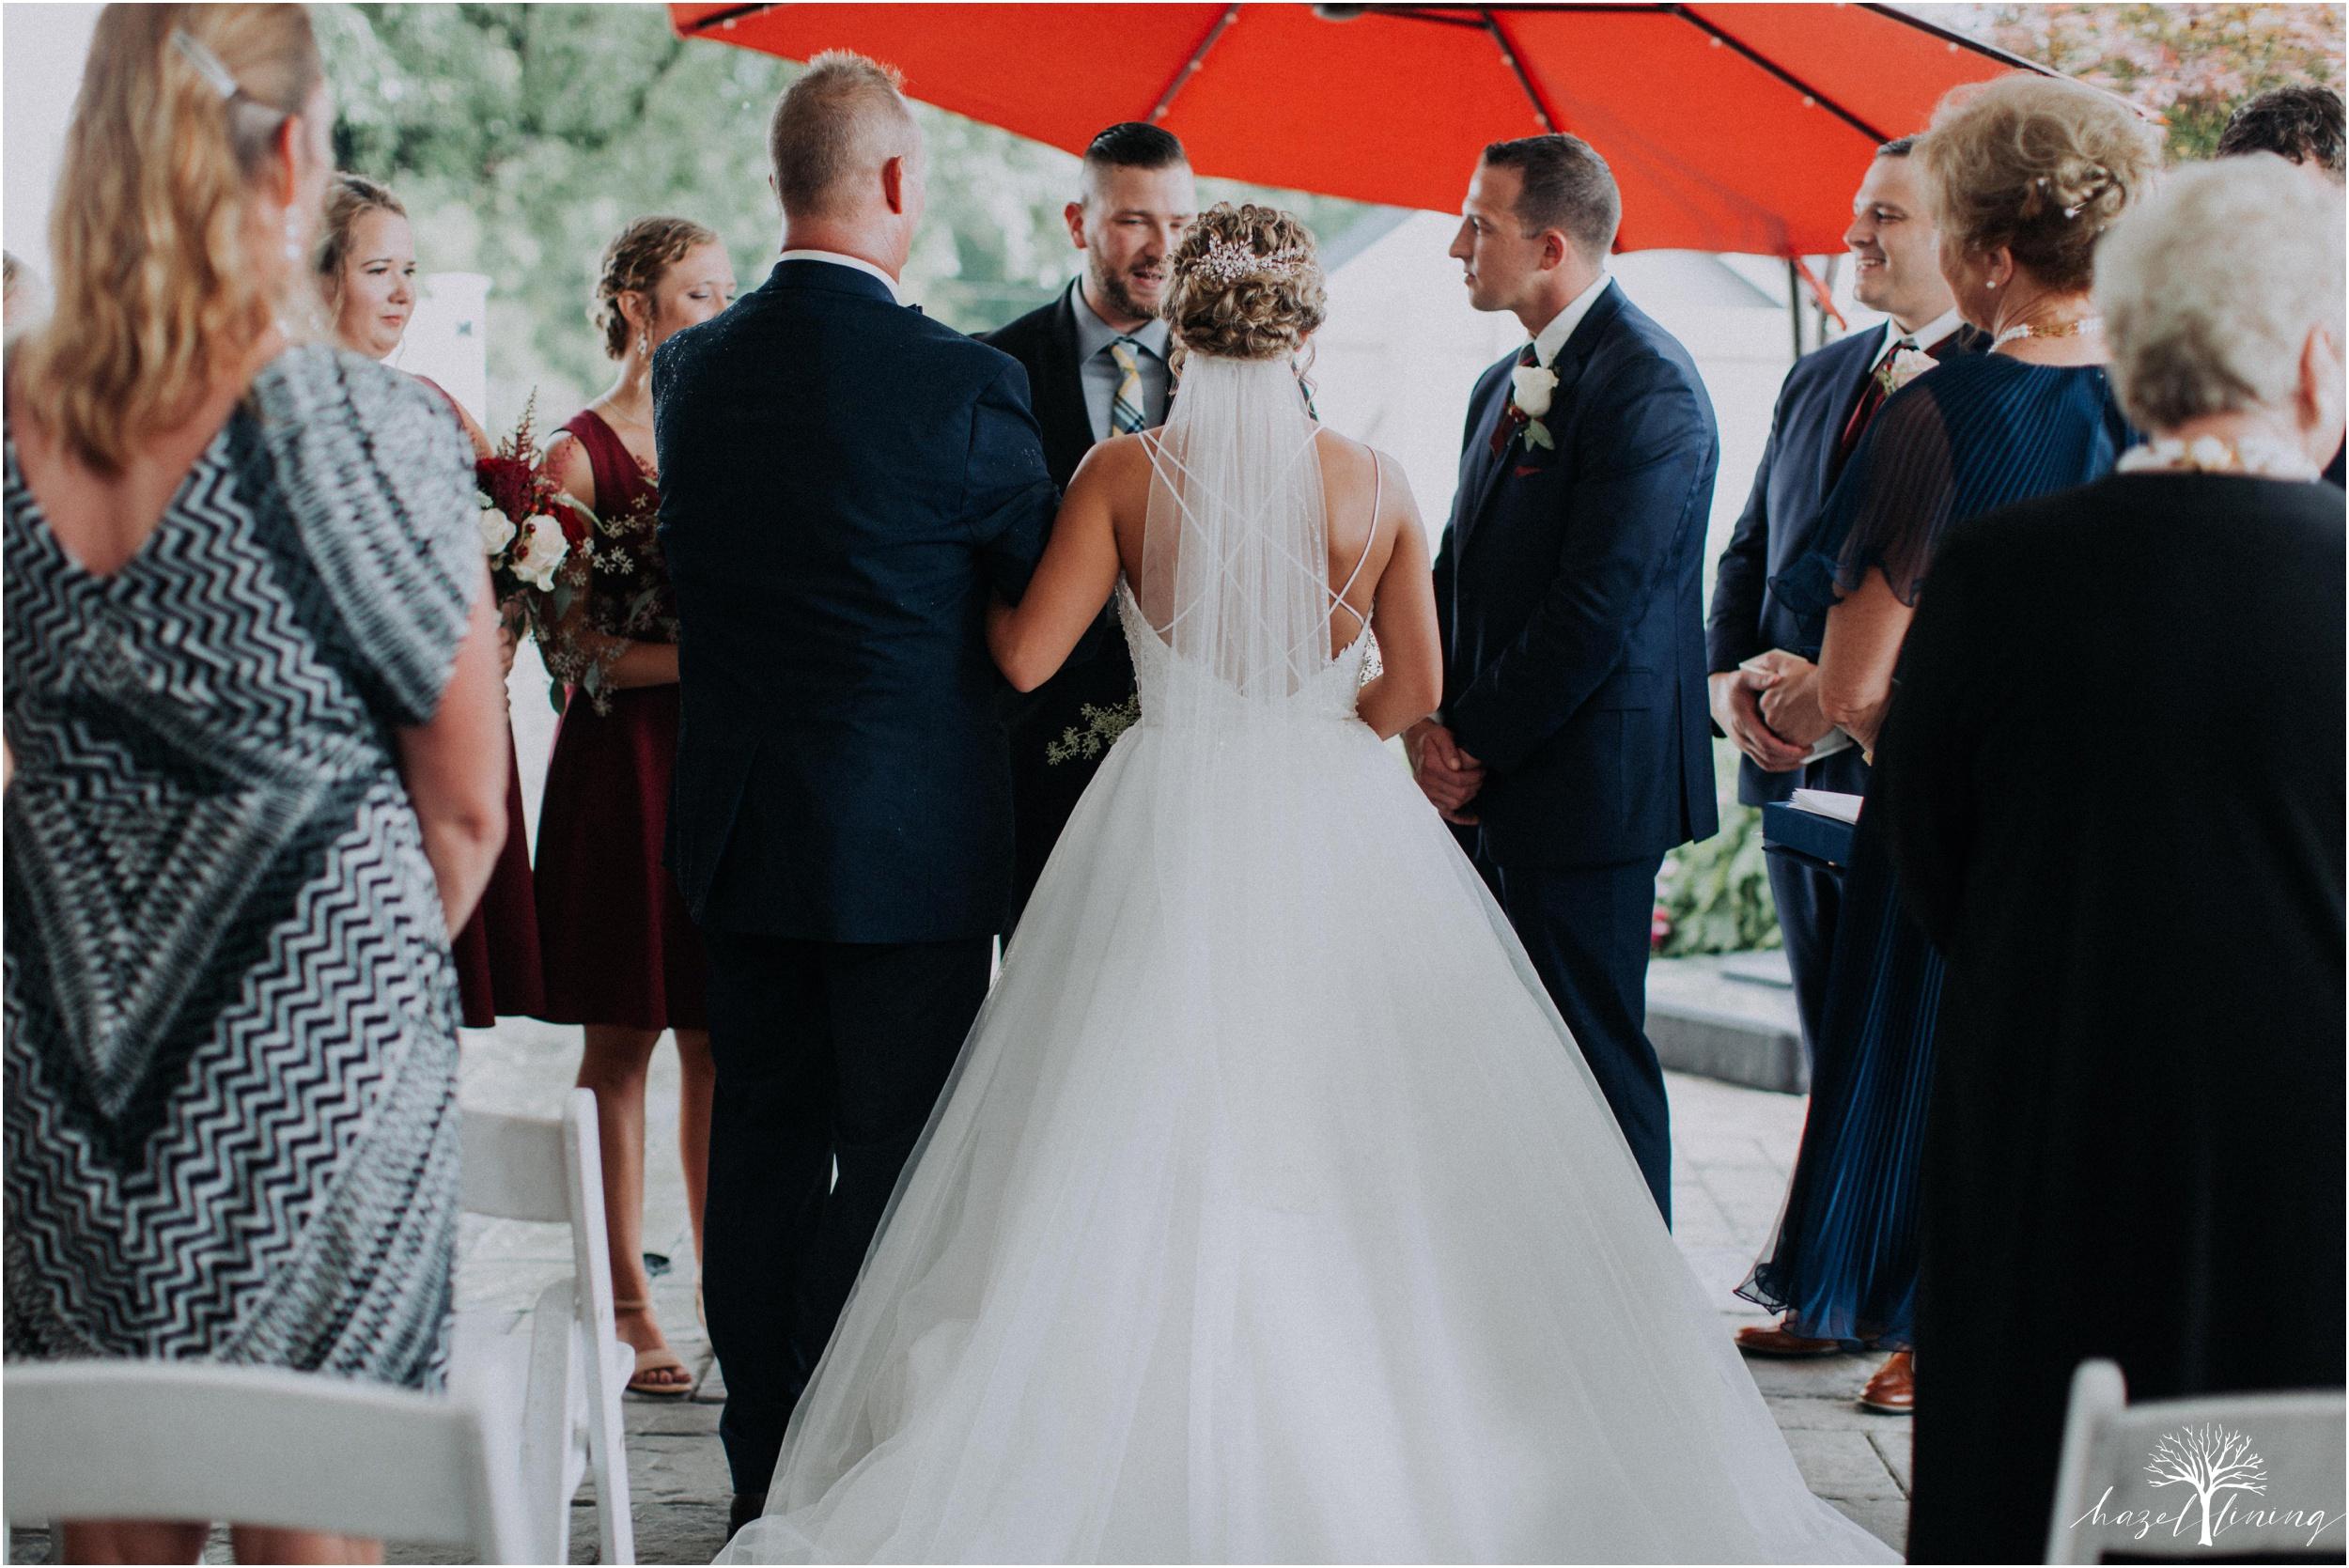 jonathan-weibel-becky-haywood-loft-at-sweetwater-cc-pennsburg-pennsylvania-rainy-day-summer-wedding-hazel-lining-travel-wedding-elopement-photography_0042.jpg